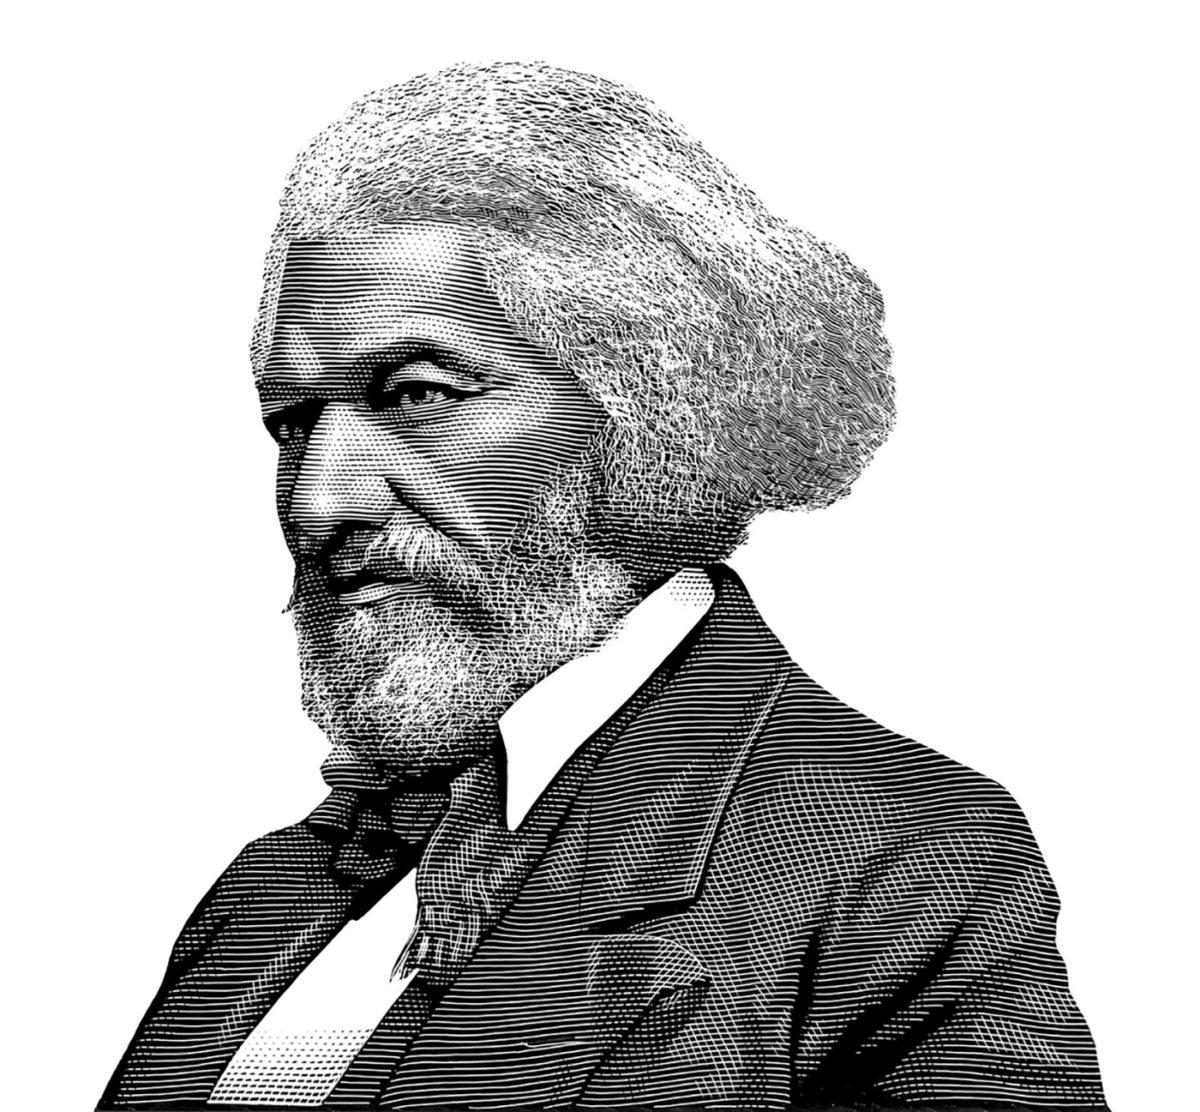 Richard Solomon - Mark-Summers-240-RS1598_Frederick_Douglass